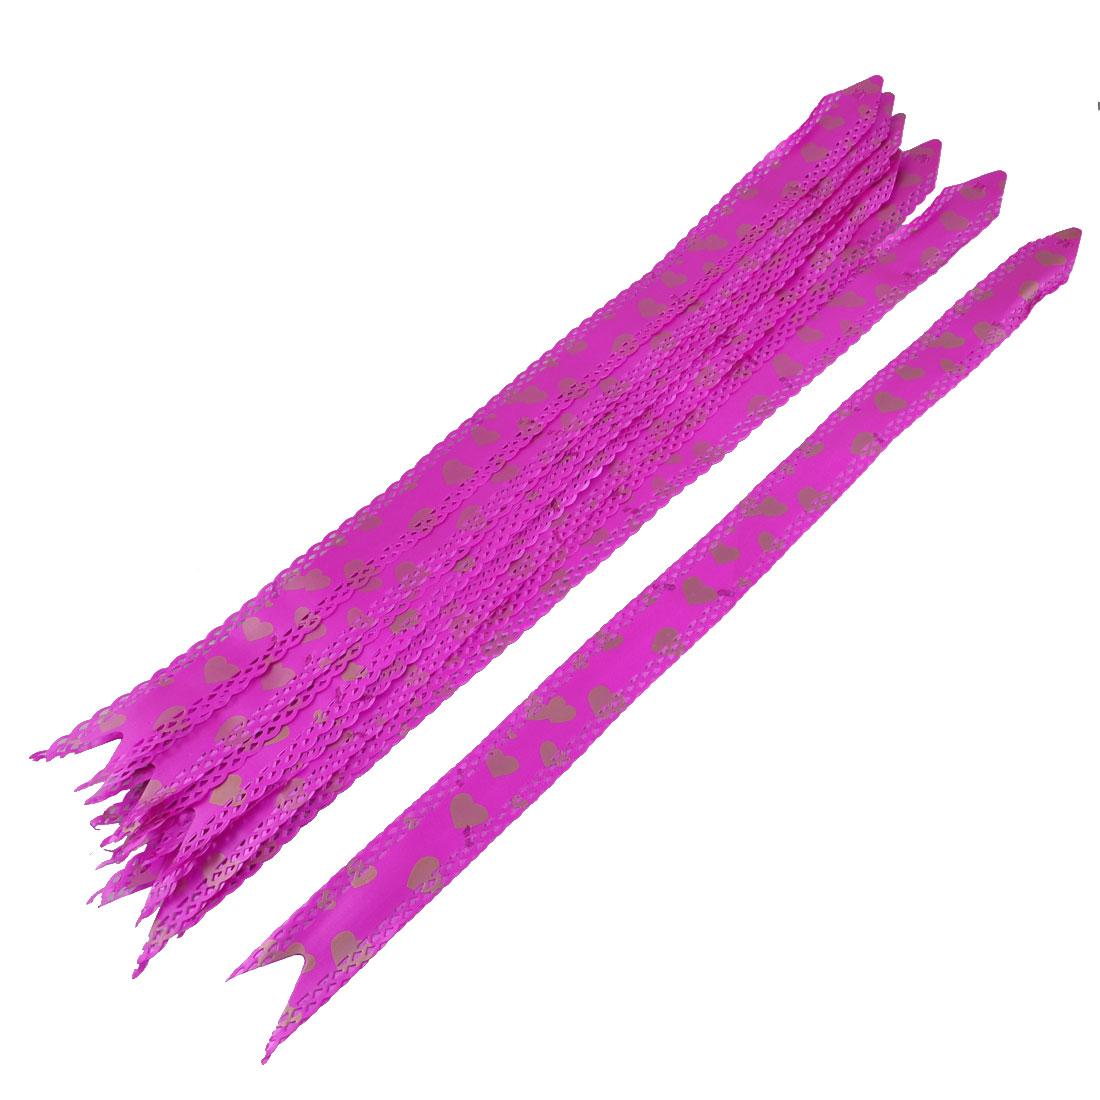 10 Pcs Wedding Gift Wrap Heart Pattern Bowtie Design DIY Pull Bow Ribbons Fuchsia